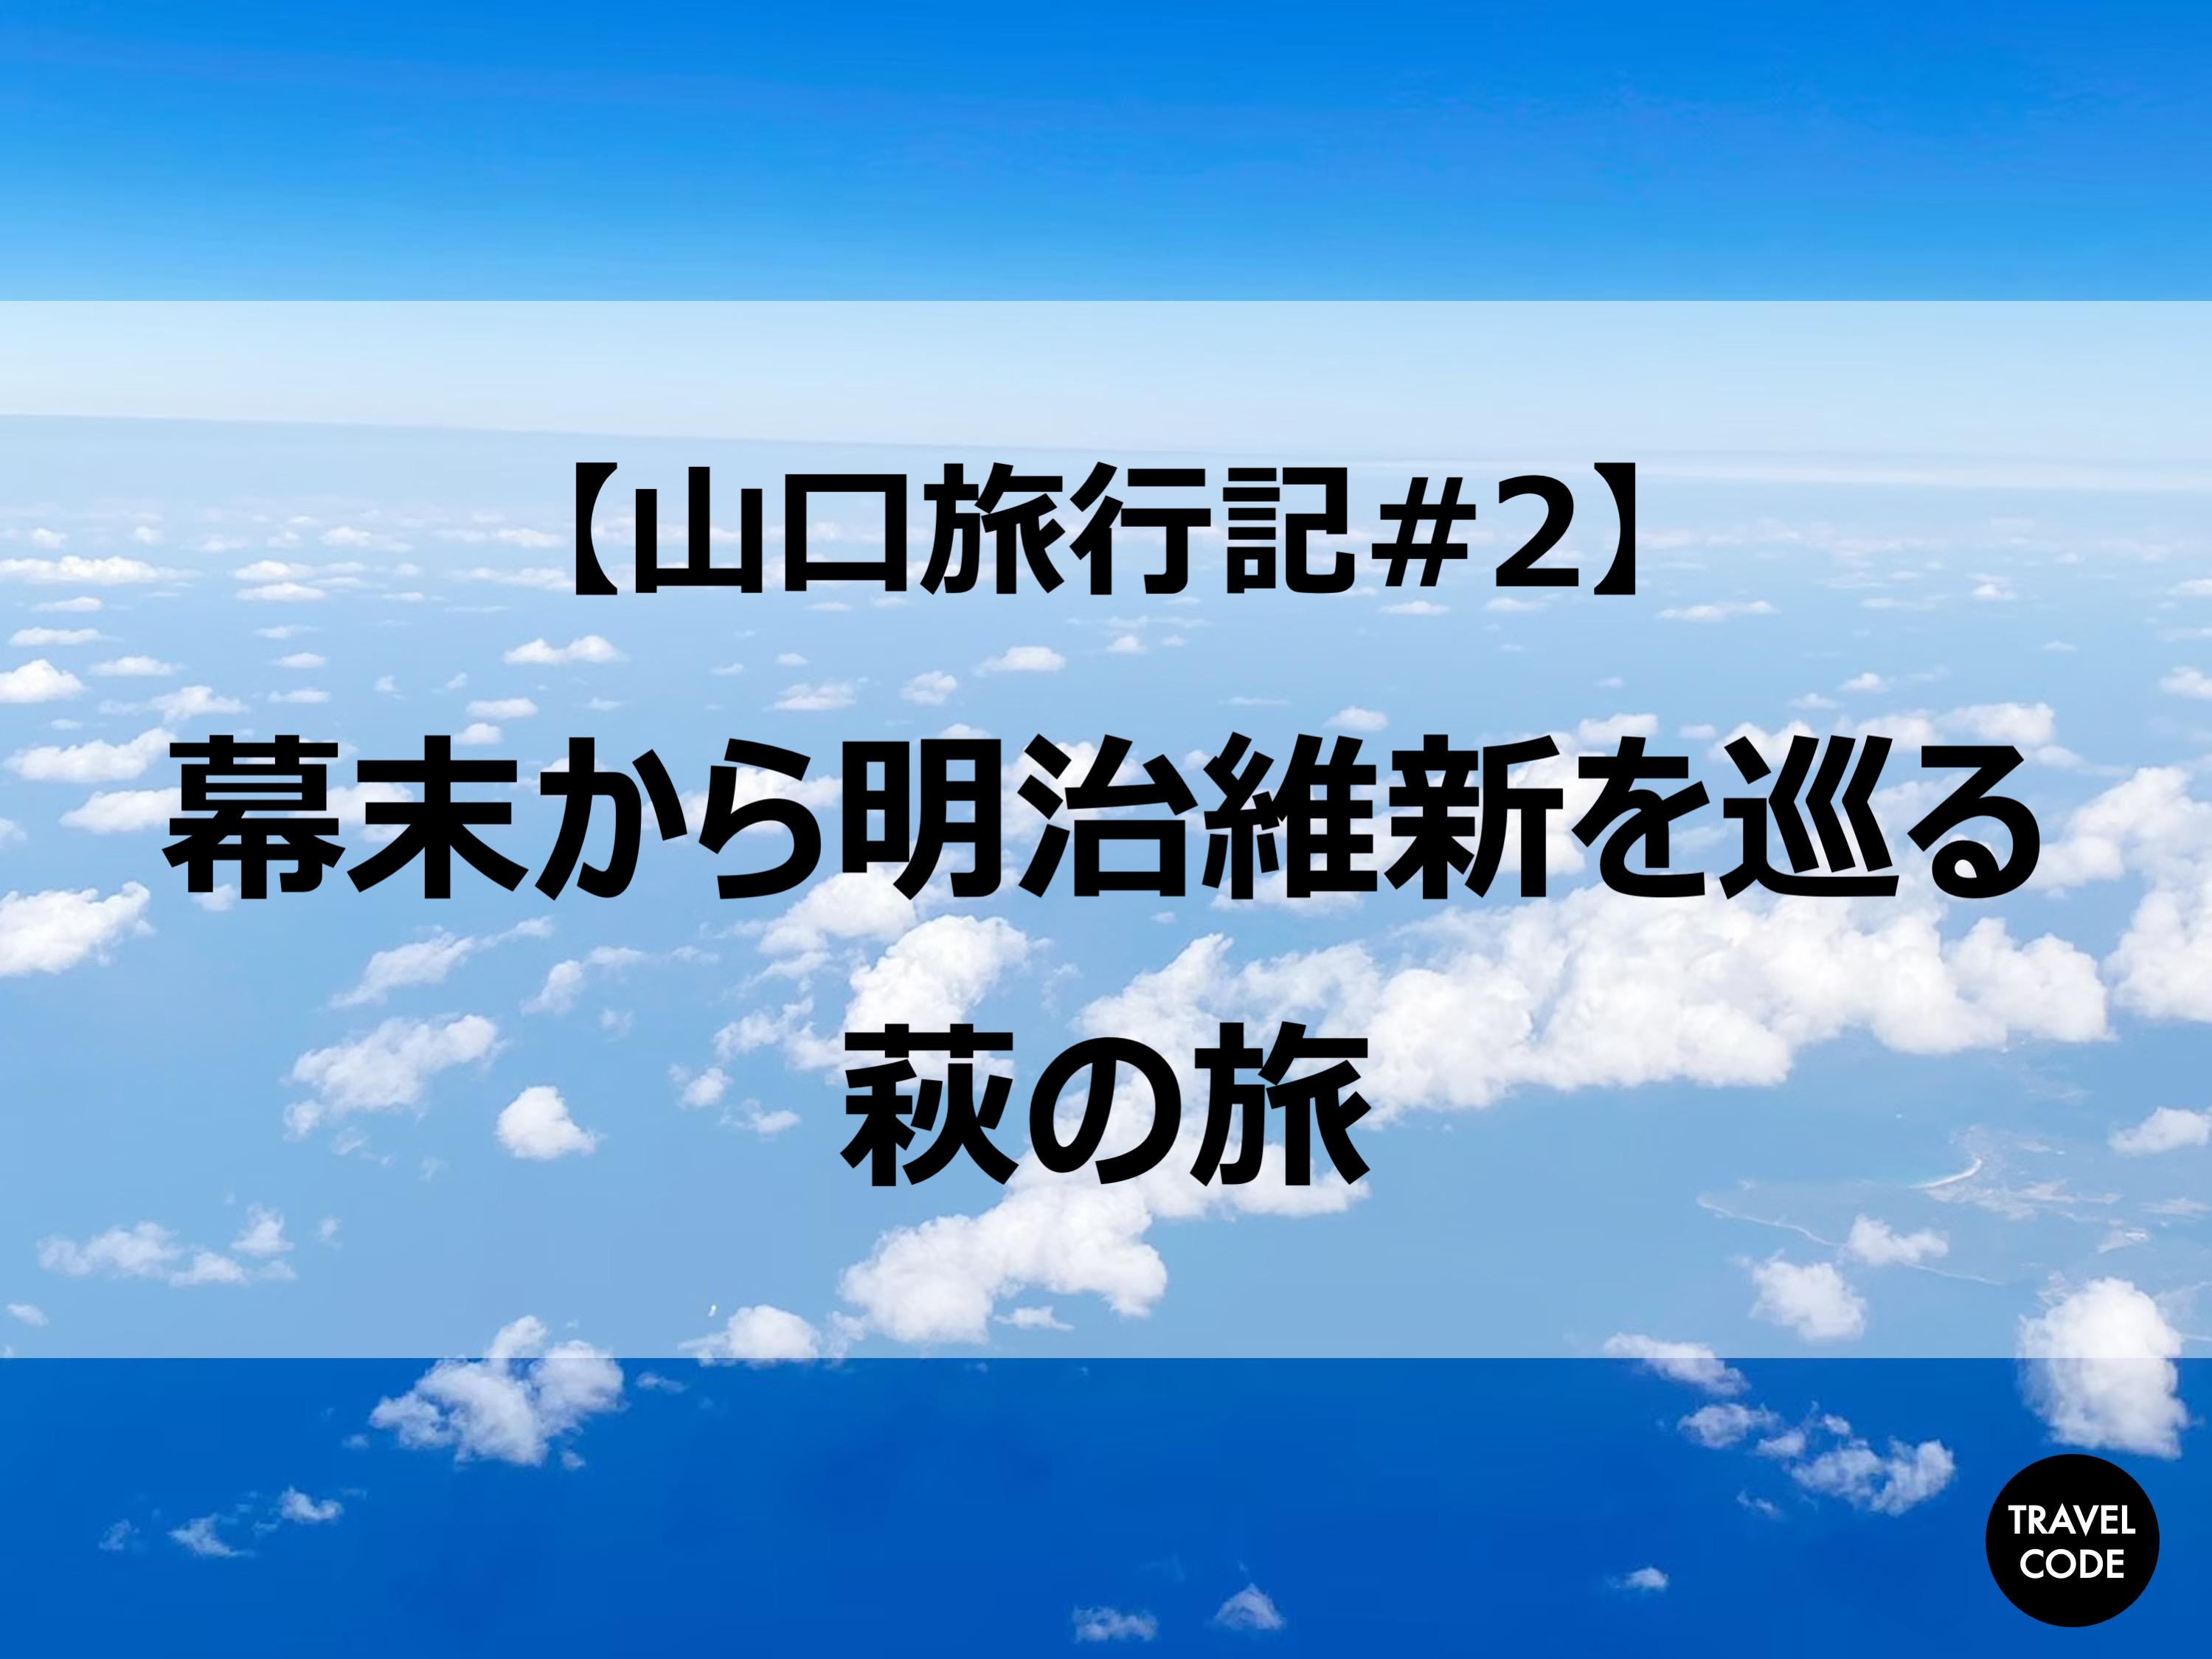 f:id:koala_log:20210909163727j:plain